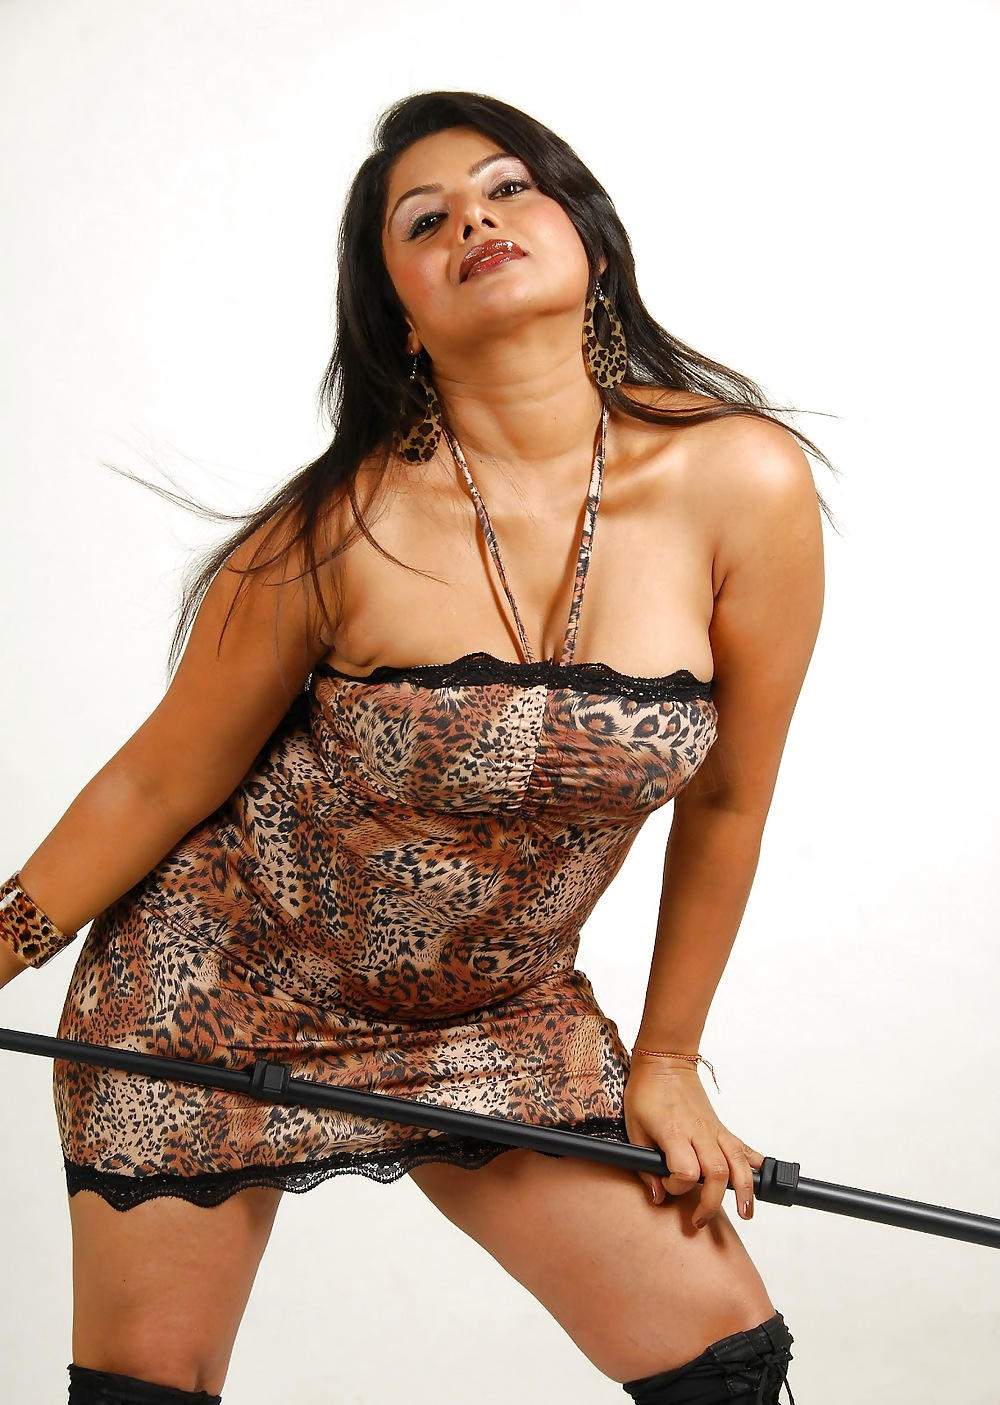 Bollywood b grade porn-5279